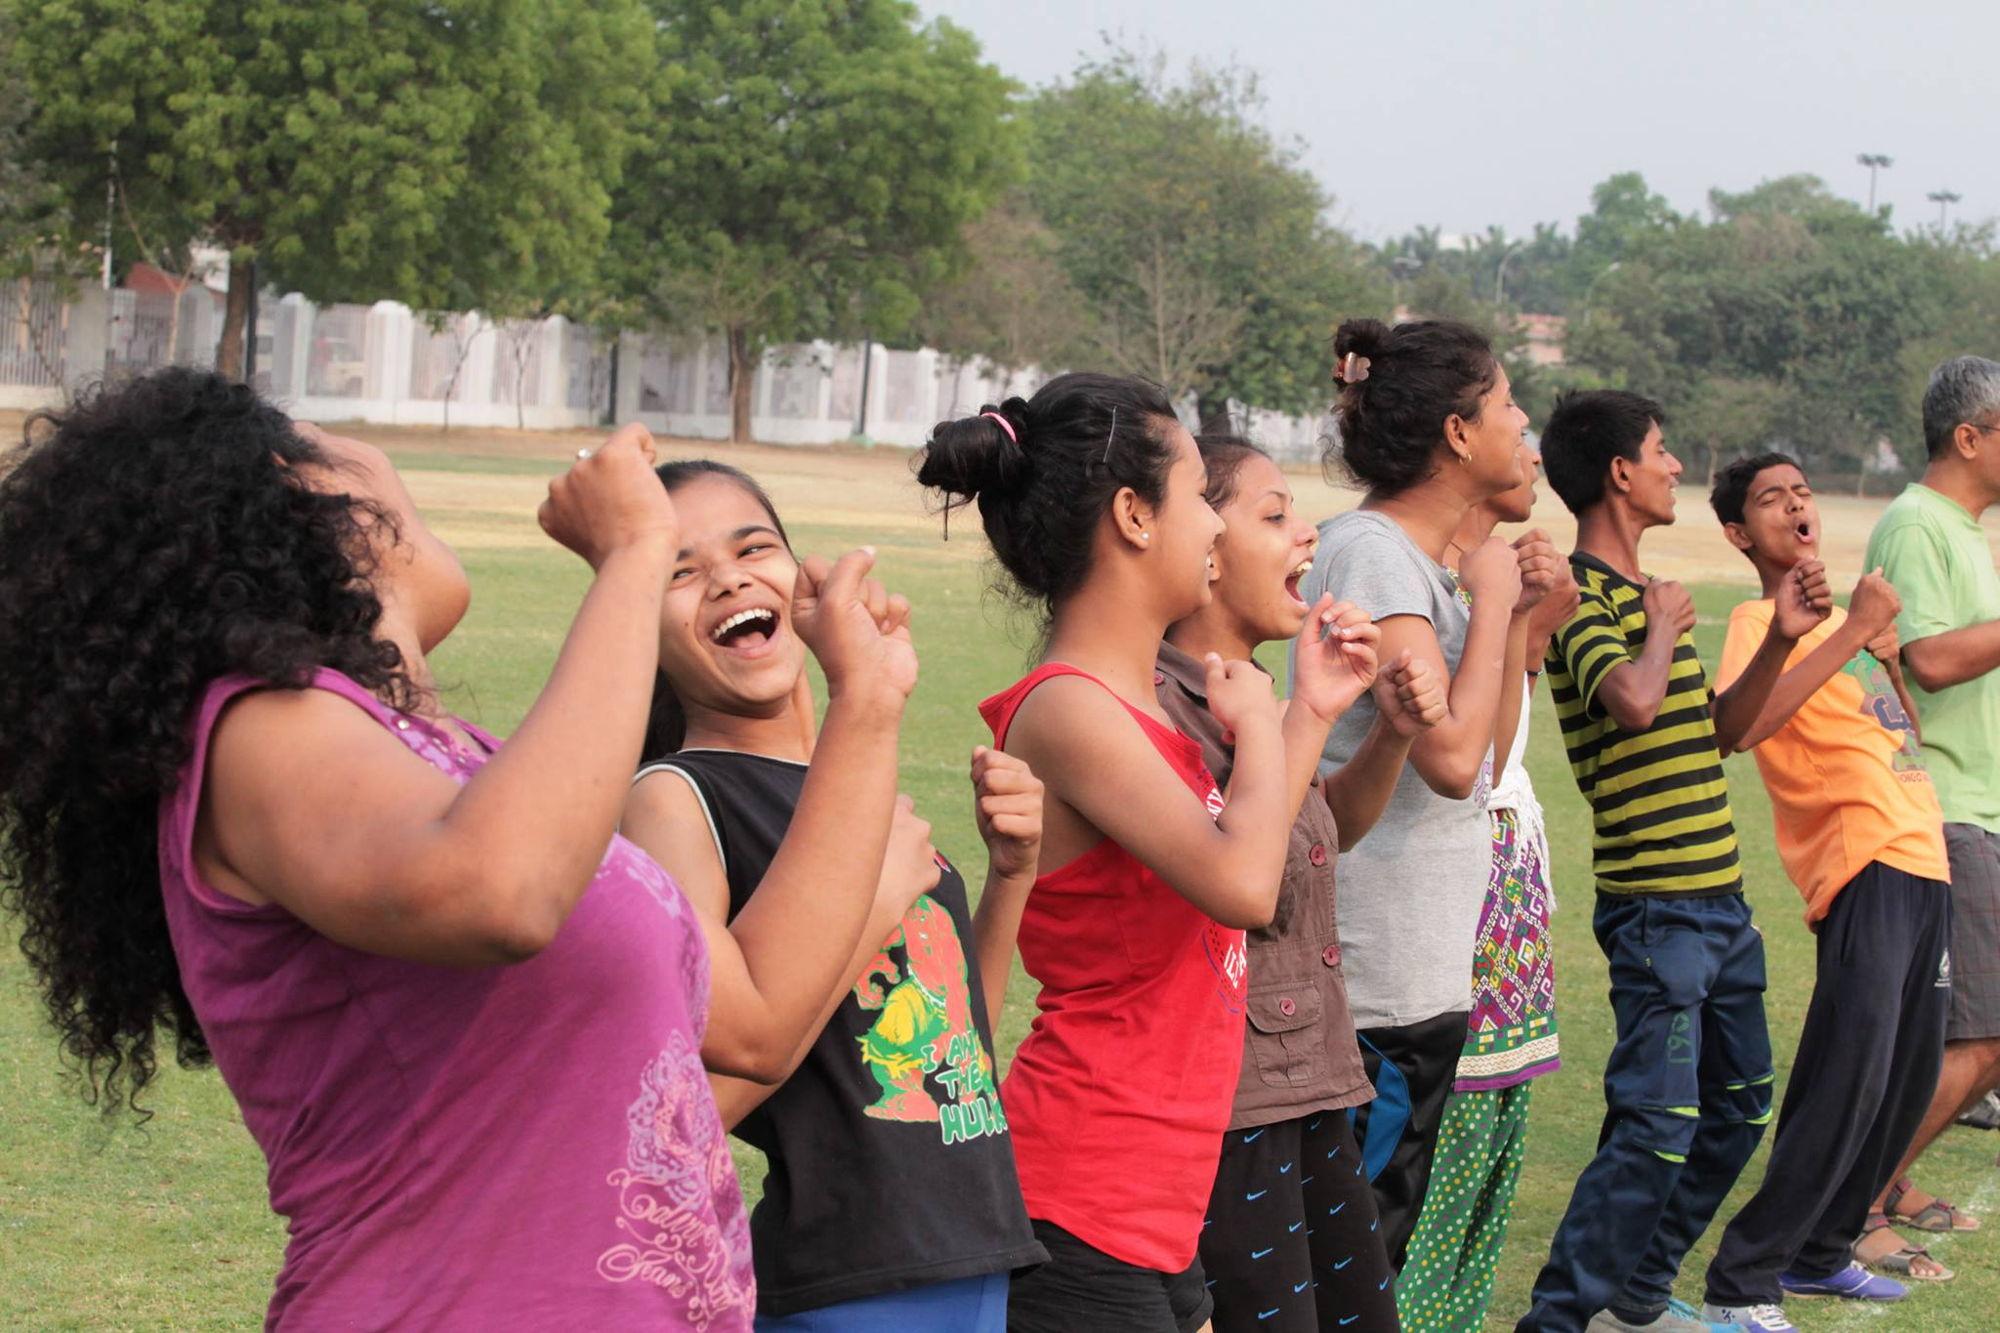 Youth leader program Bridging the Gap